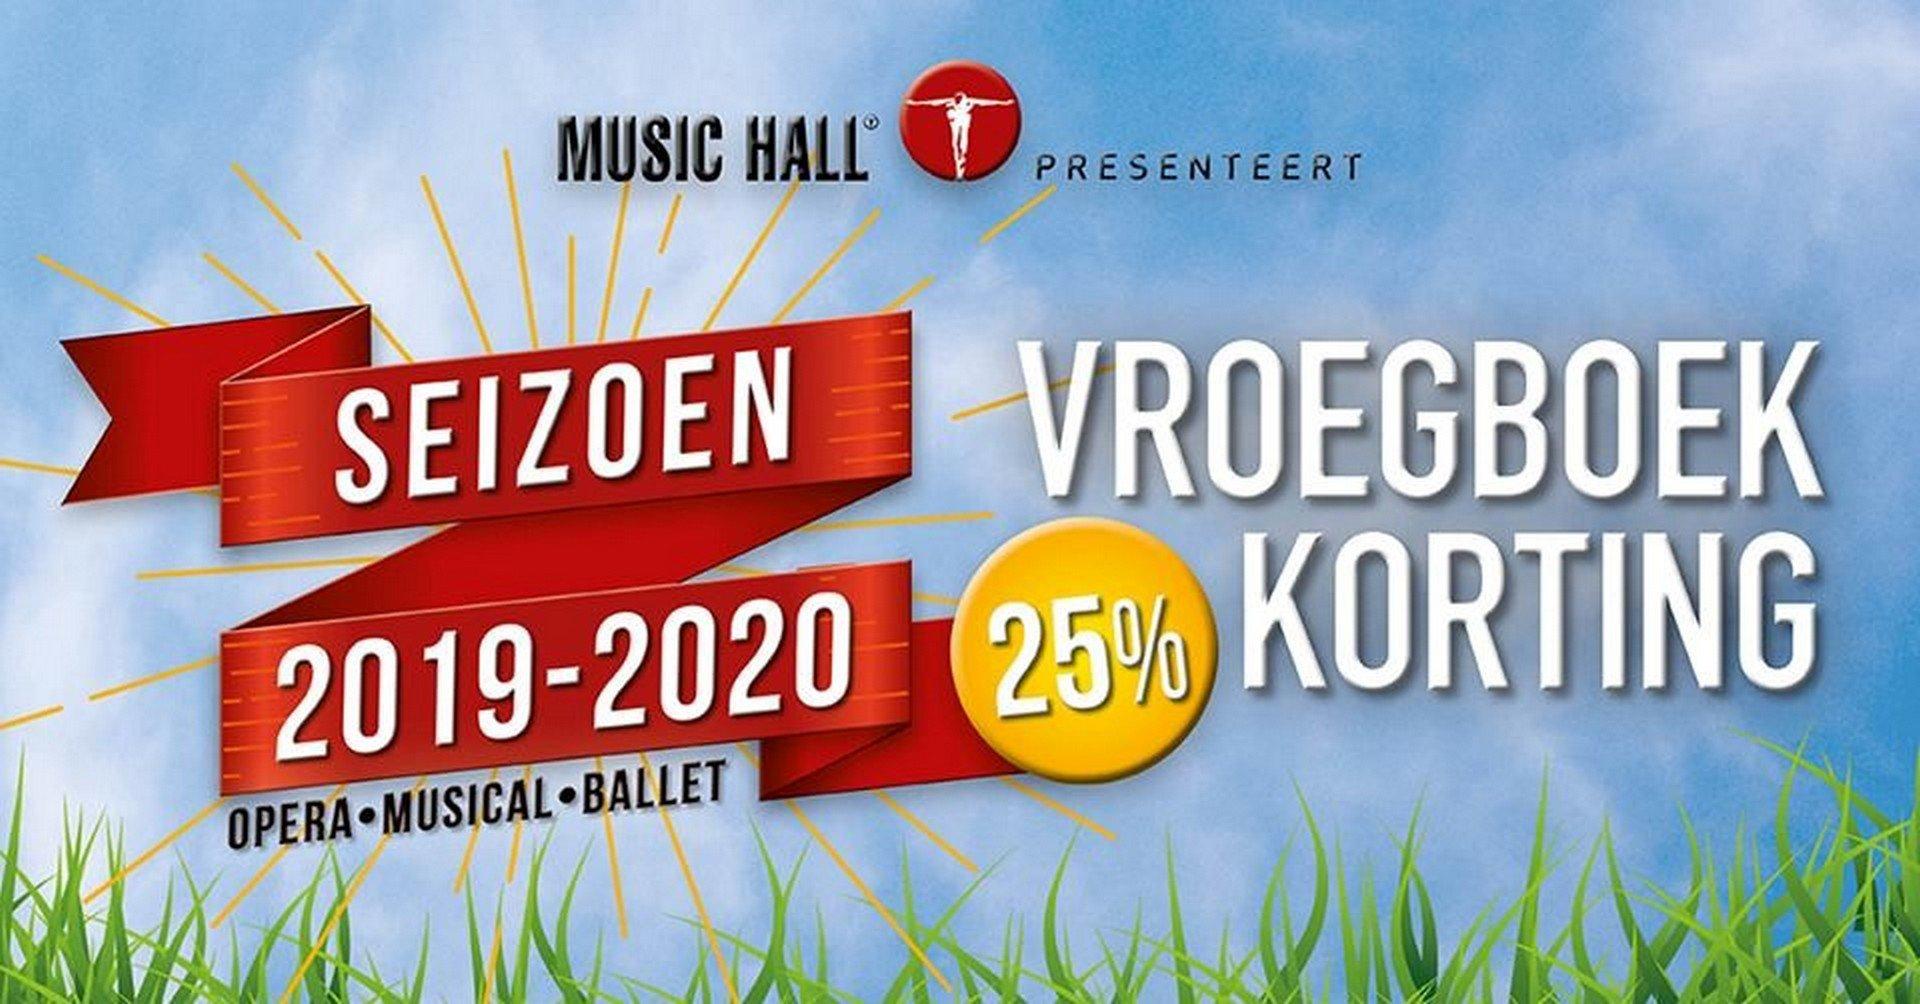 Music Hall presenteert prachtig aanbod seizoen 2019 - 2020 - Music Hall Vroegboekkorting